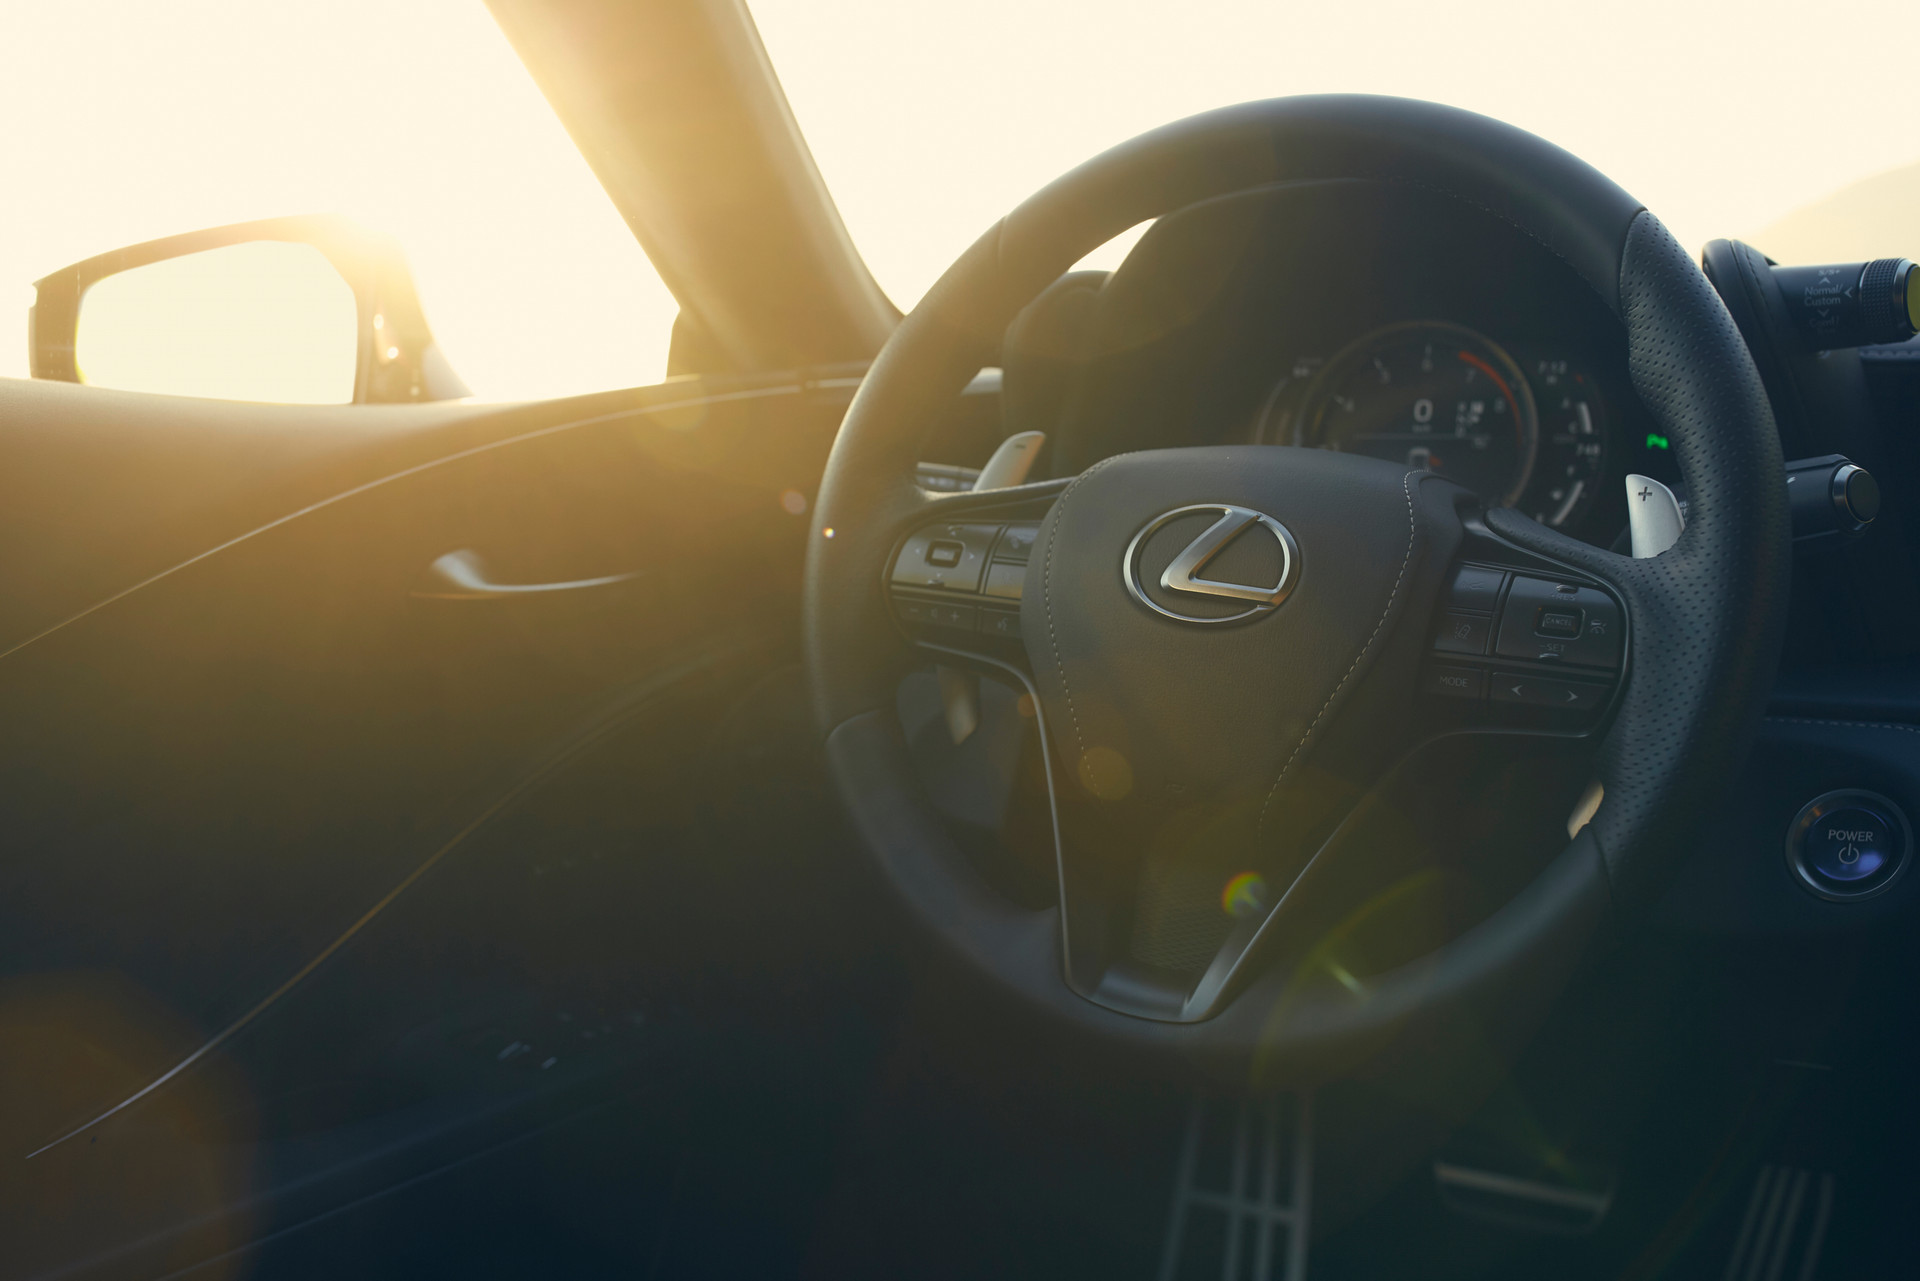 LC_0f Lexus_heandme_019.jpg